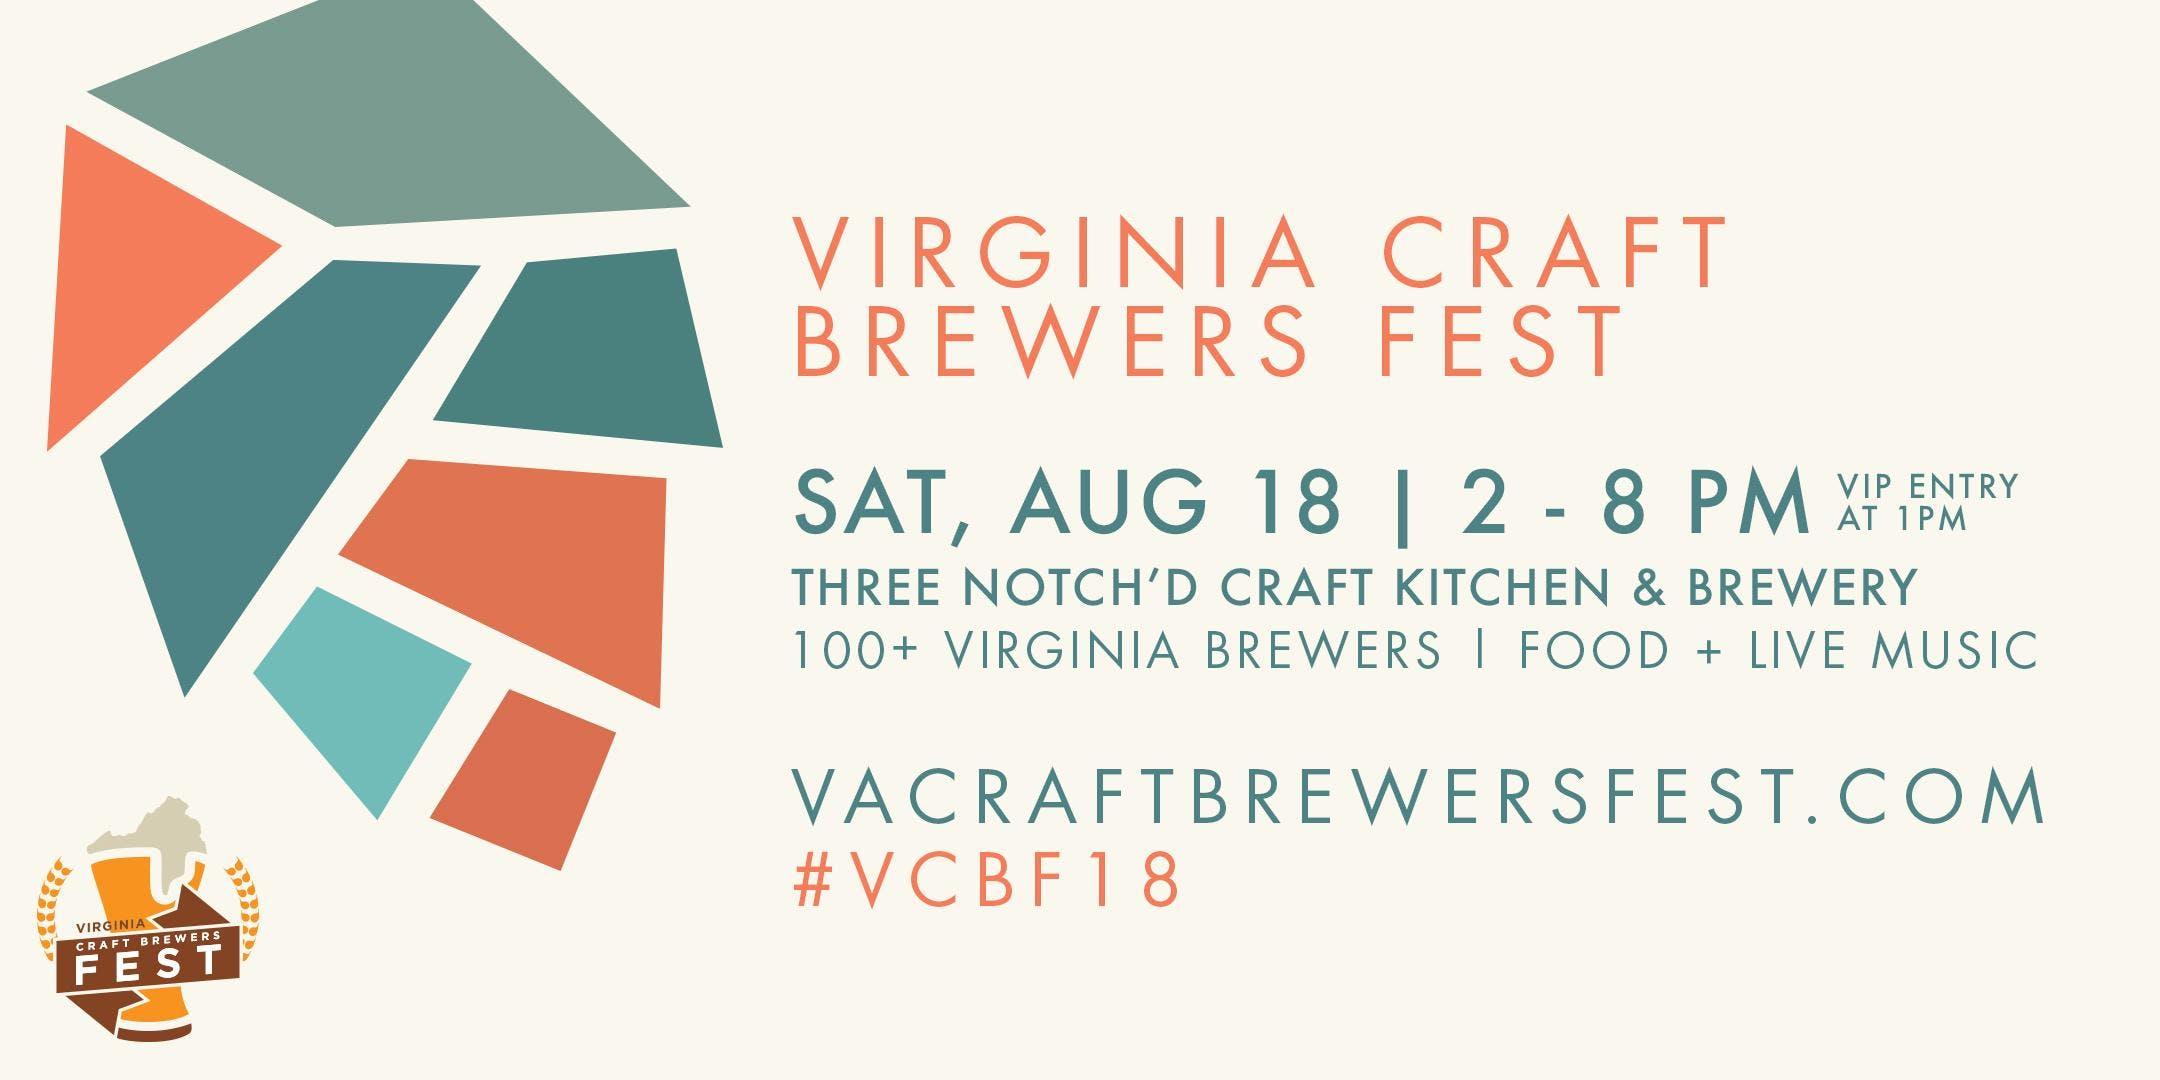 2018 Virginia Craft Brewers Fest